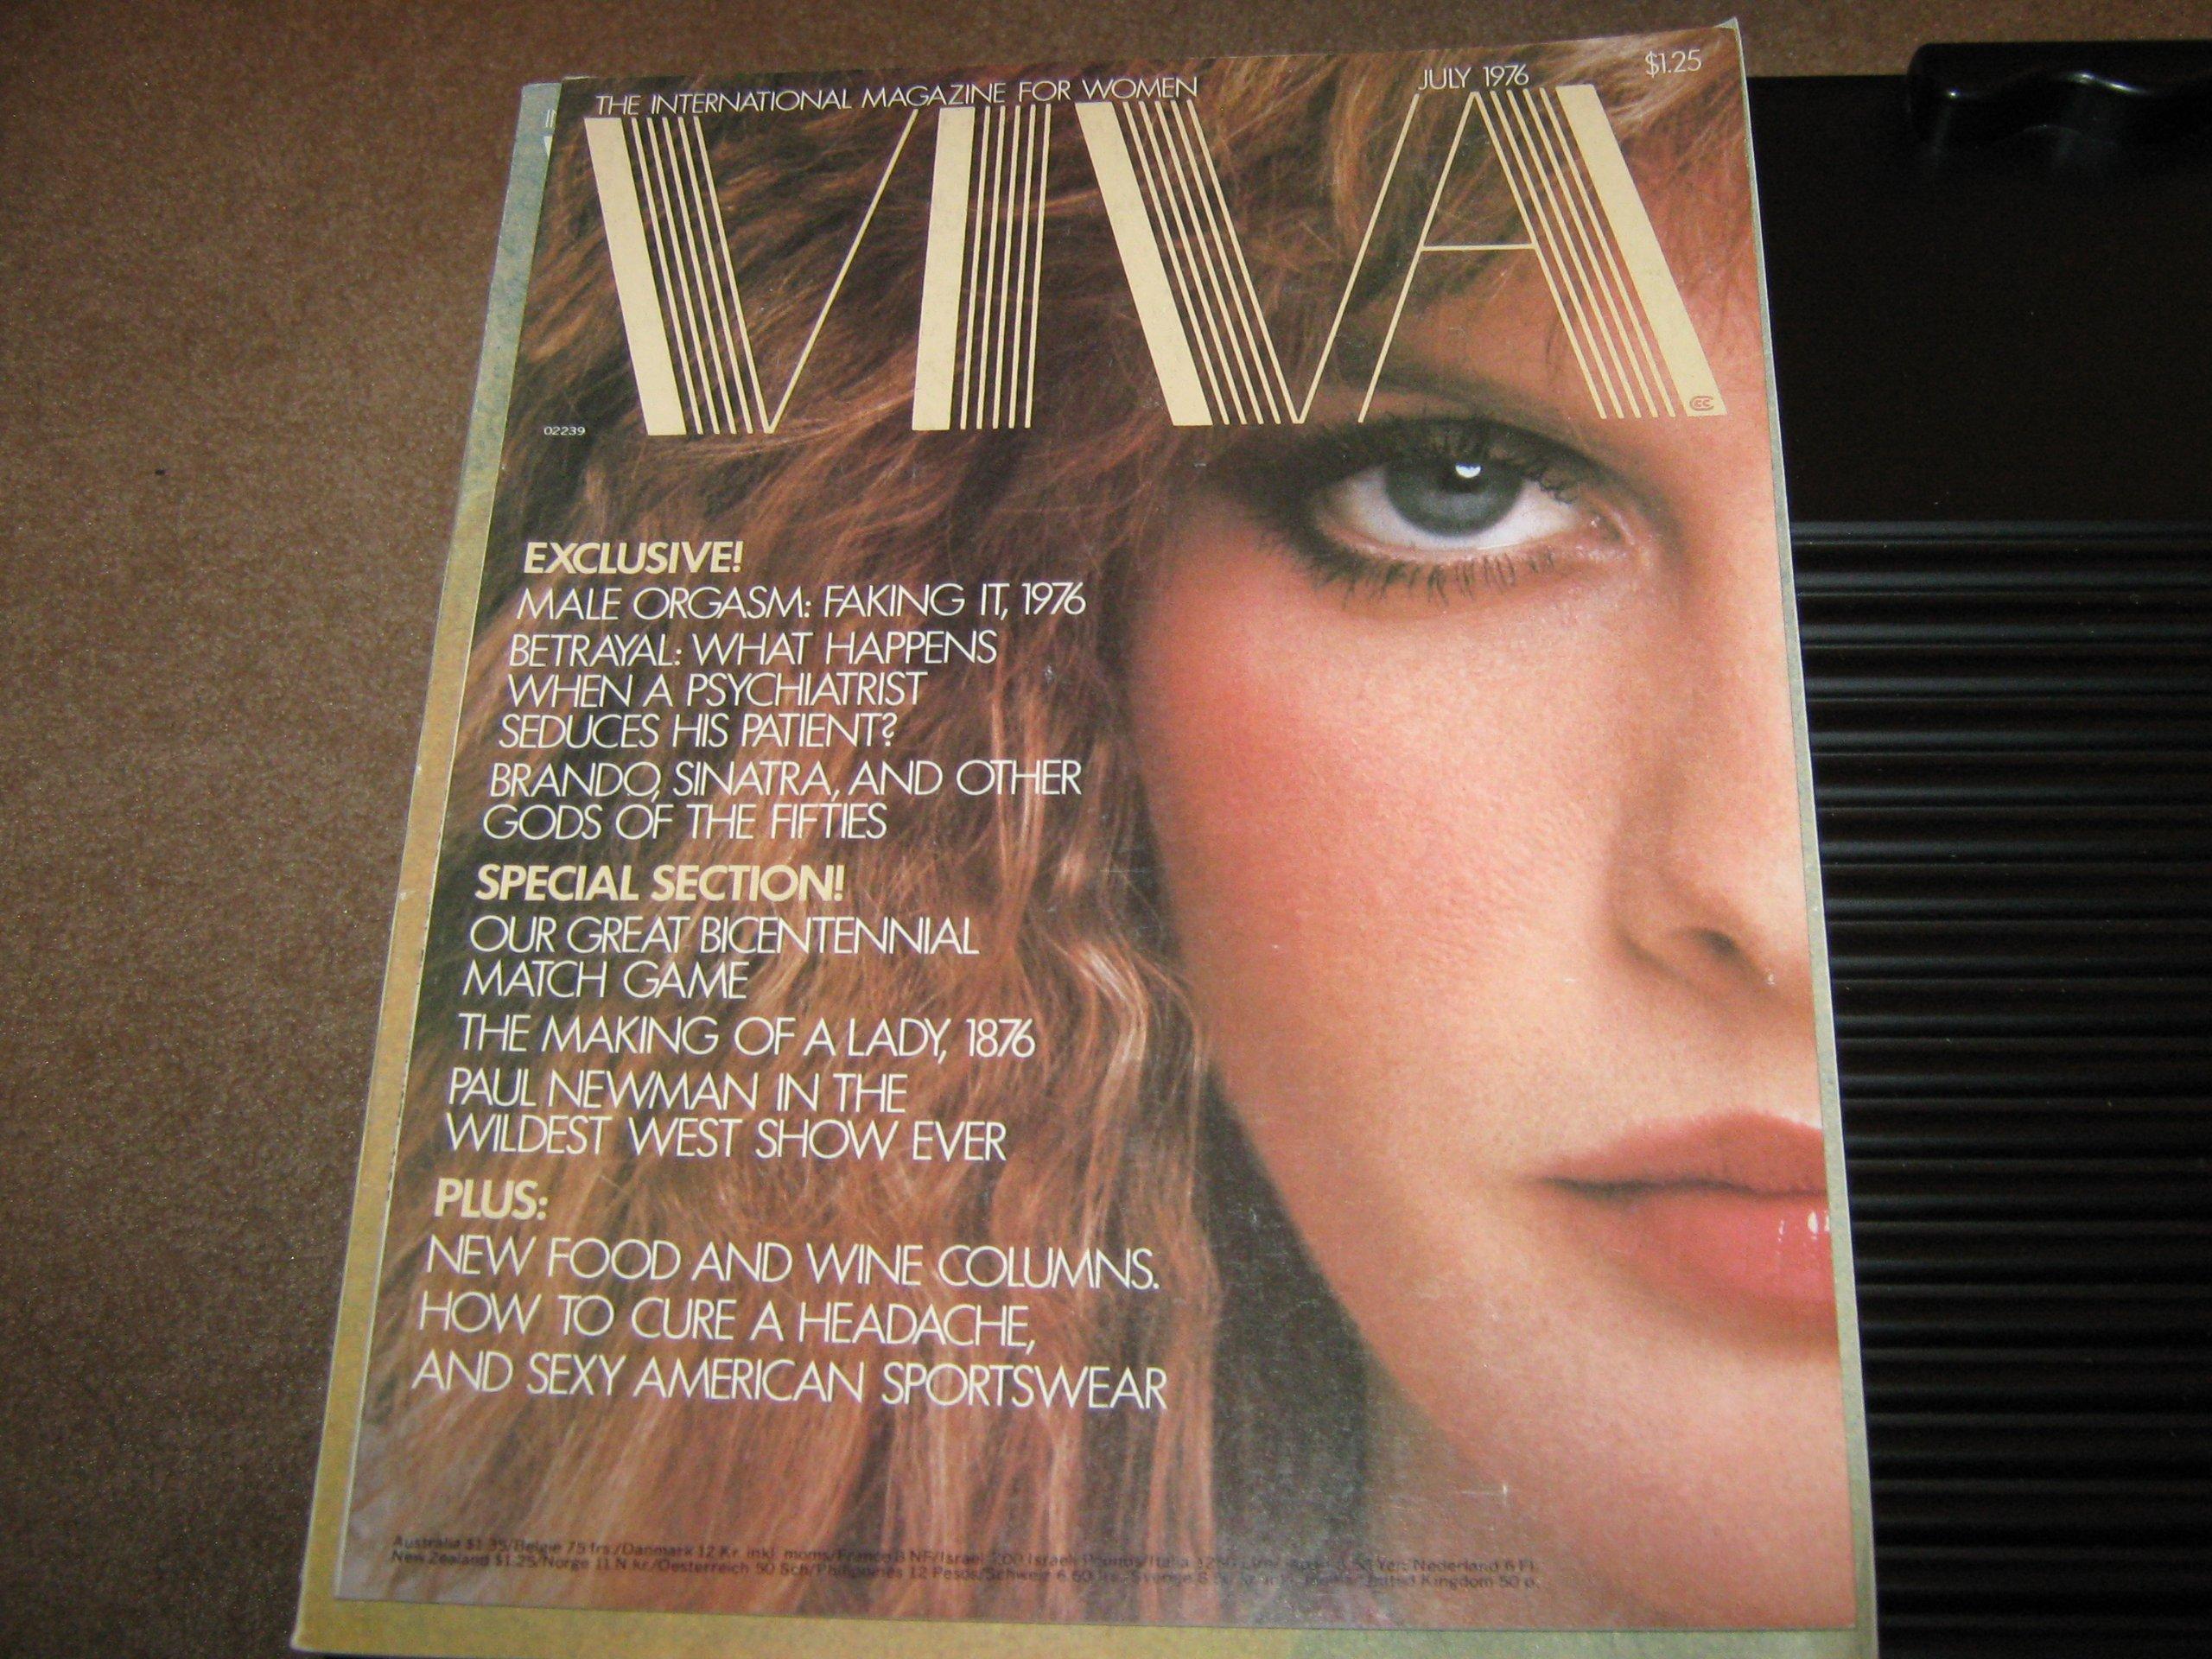 Viva Magazine (Brando , Sinatra , Paul newman , Male Orgasm , Psychiatrist  Betrayal, July 1976) Paperback – 1976